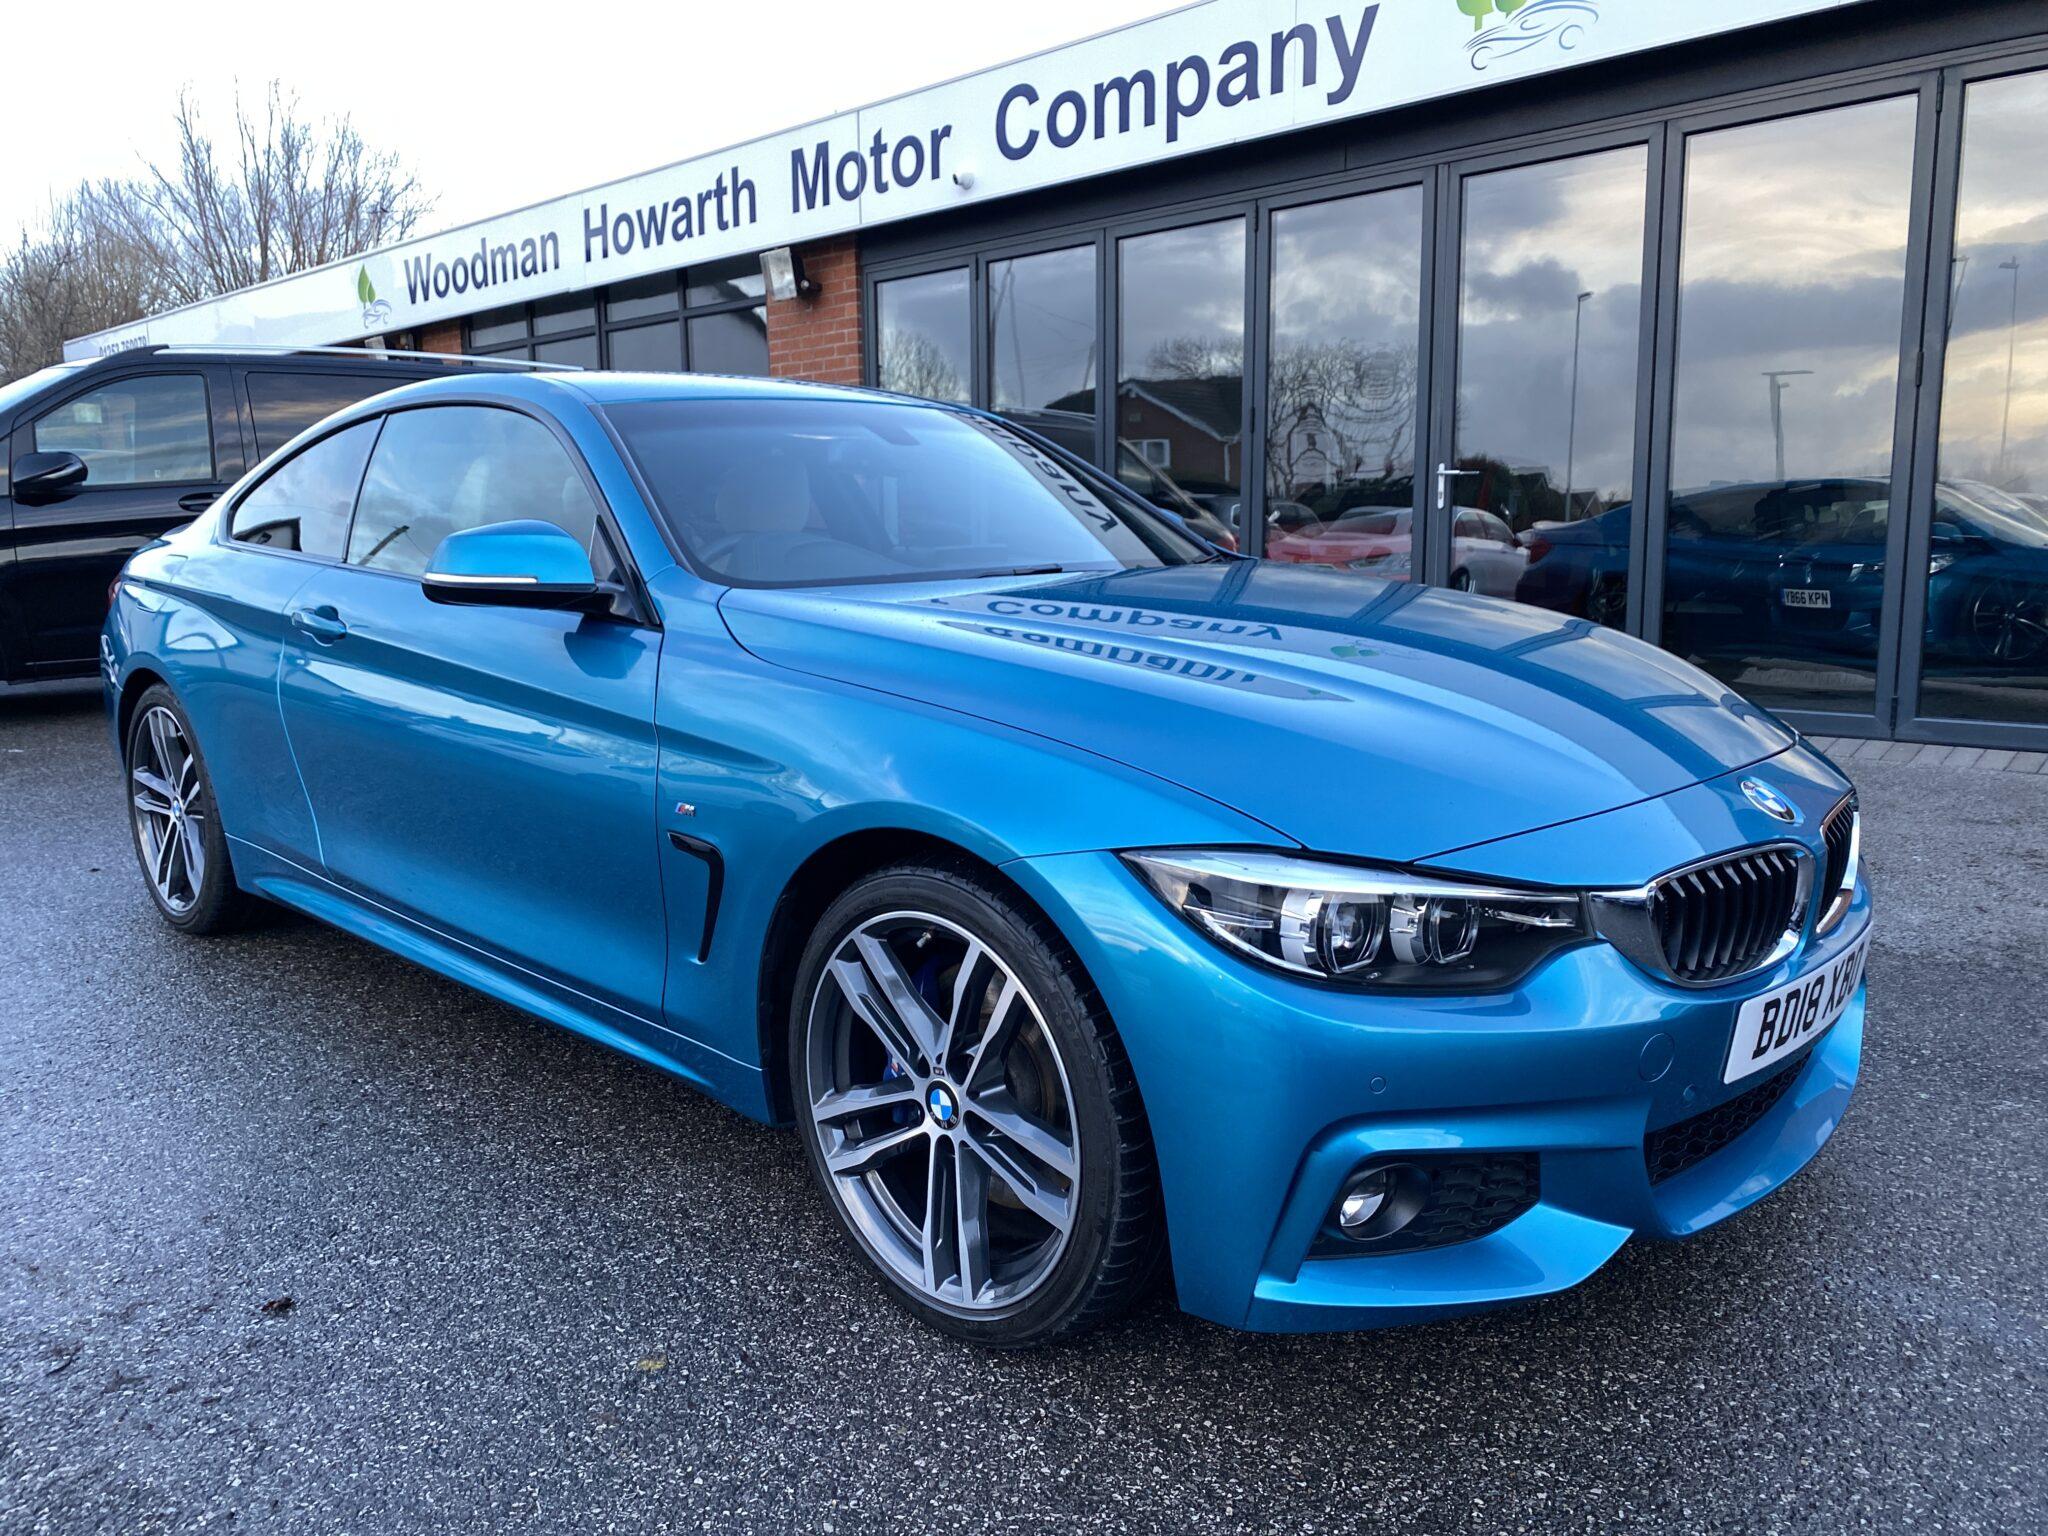 2018 18 BMW 420d M SPORT COUPE AUTOMATIC 19